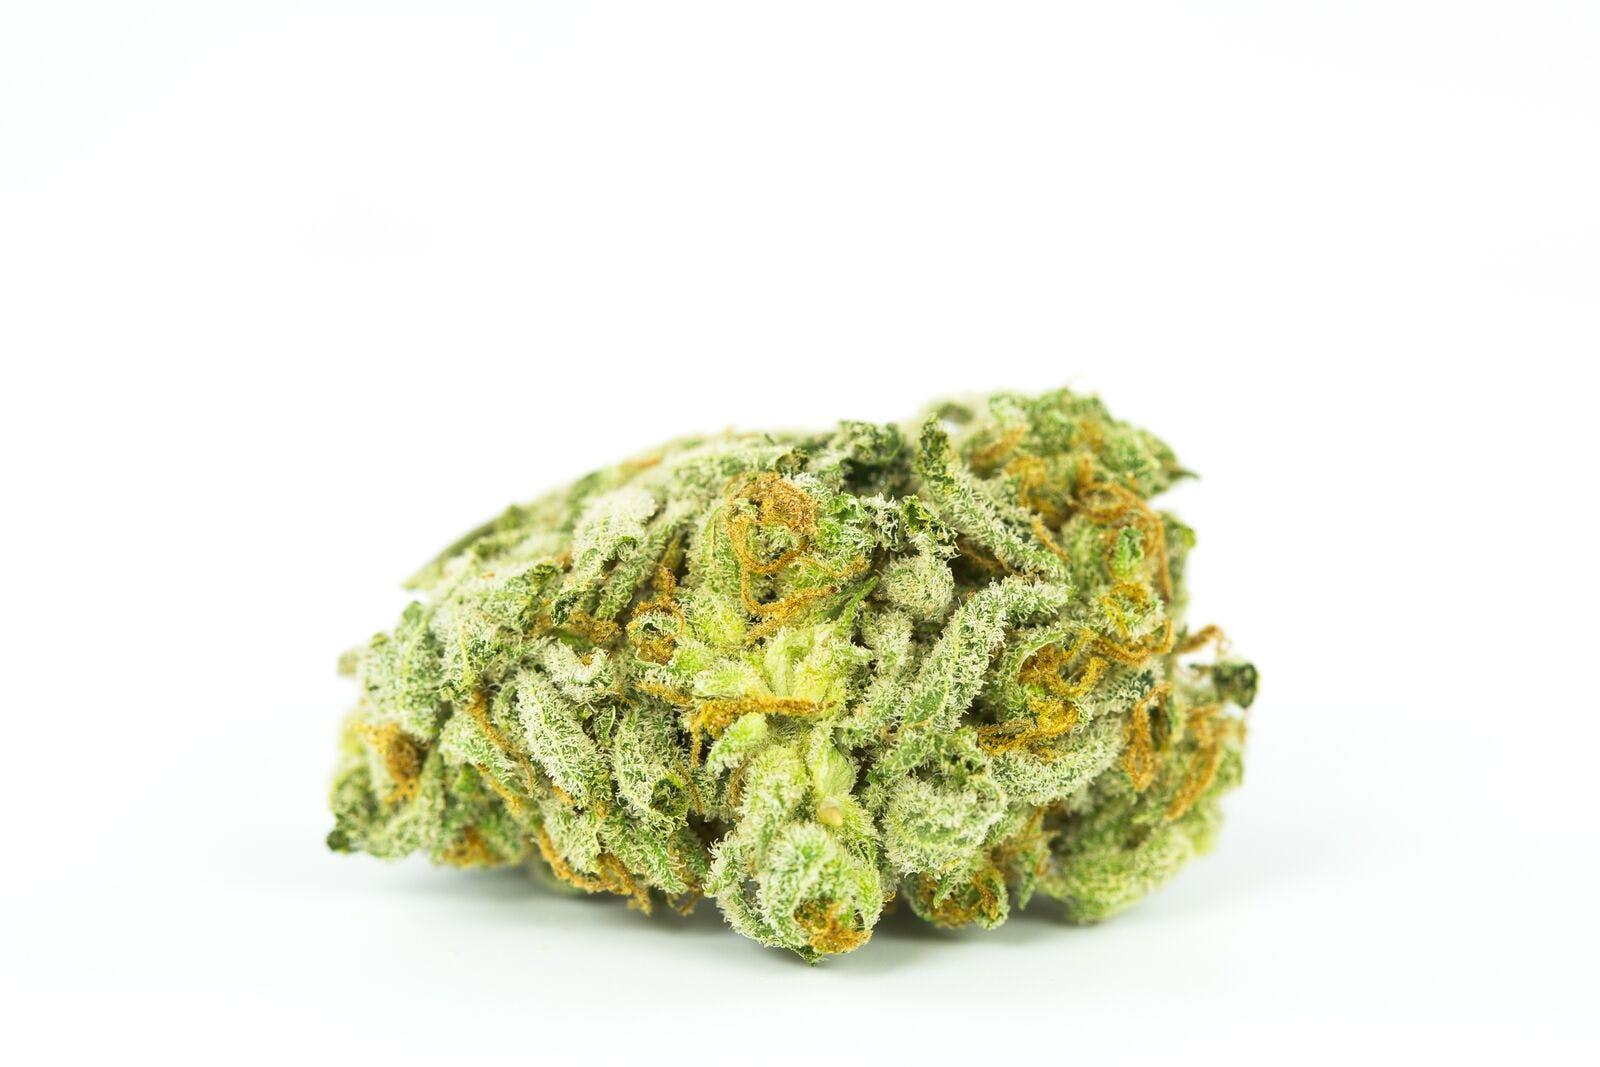 Citrus Sap Weed; Citrus Sap Cannabis Strain; Citrus Sap Hybrid Marijuana Strain